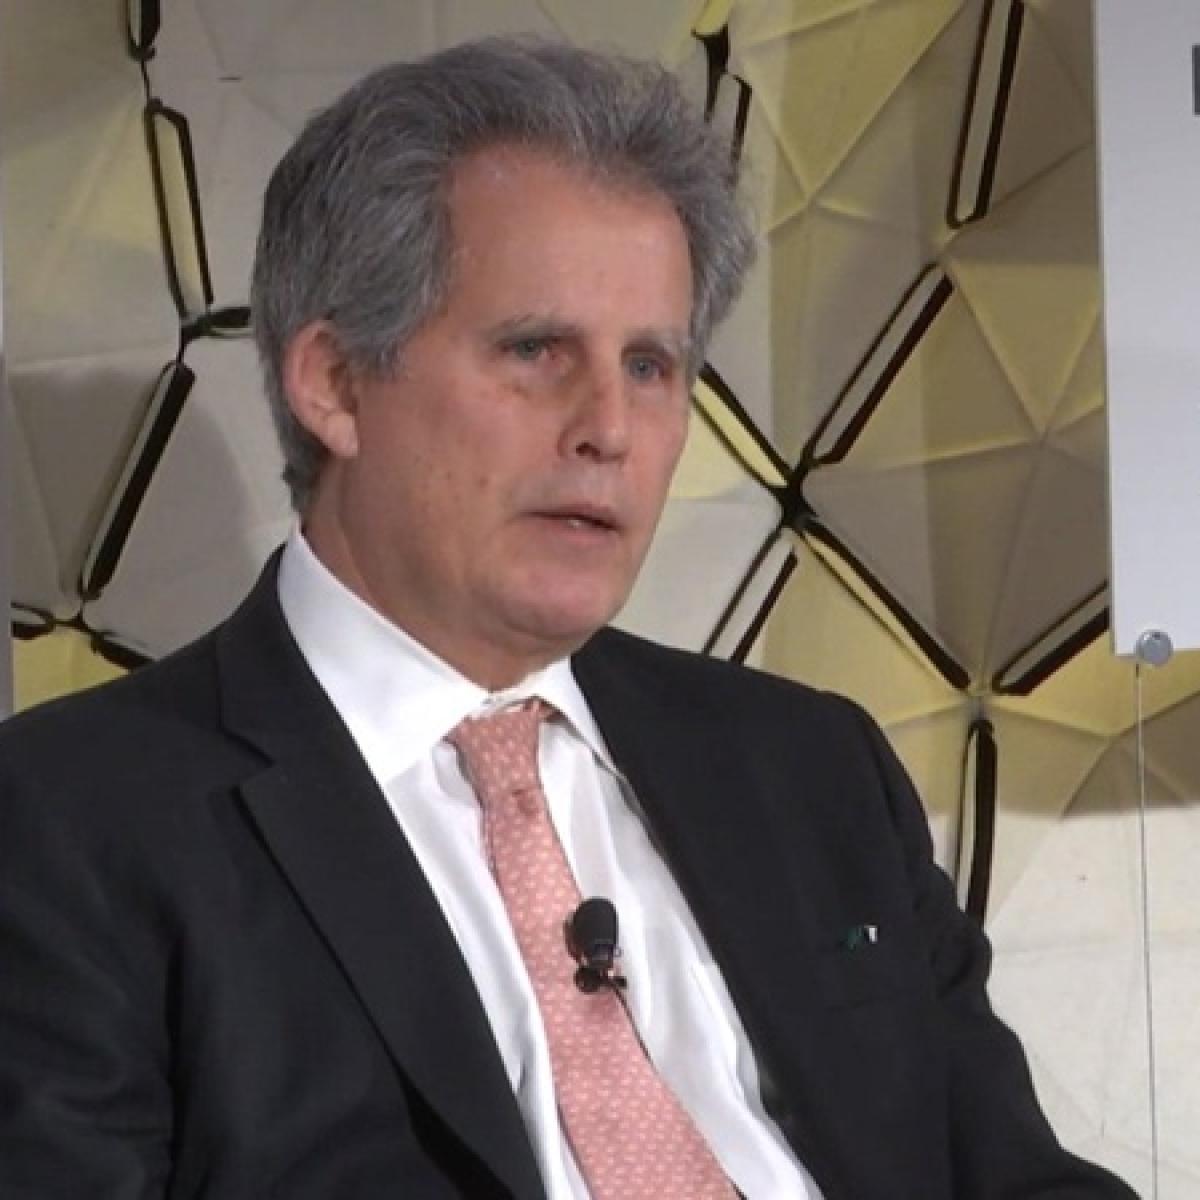 David Lipton to serve as acting MD: IMF board